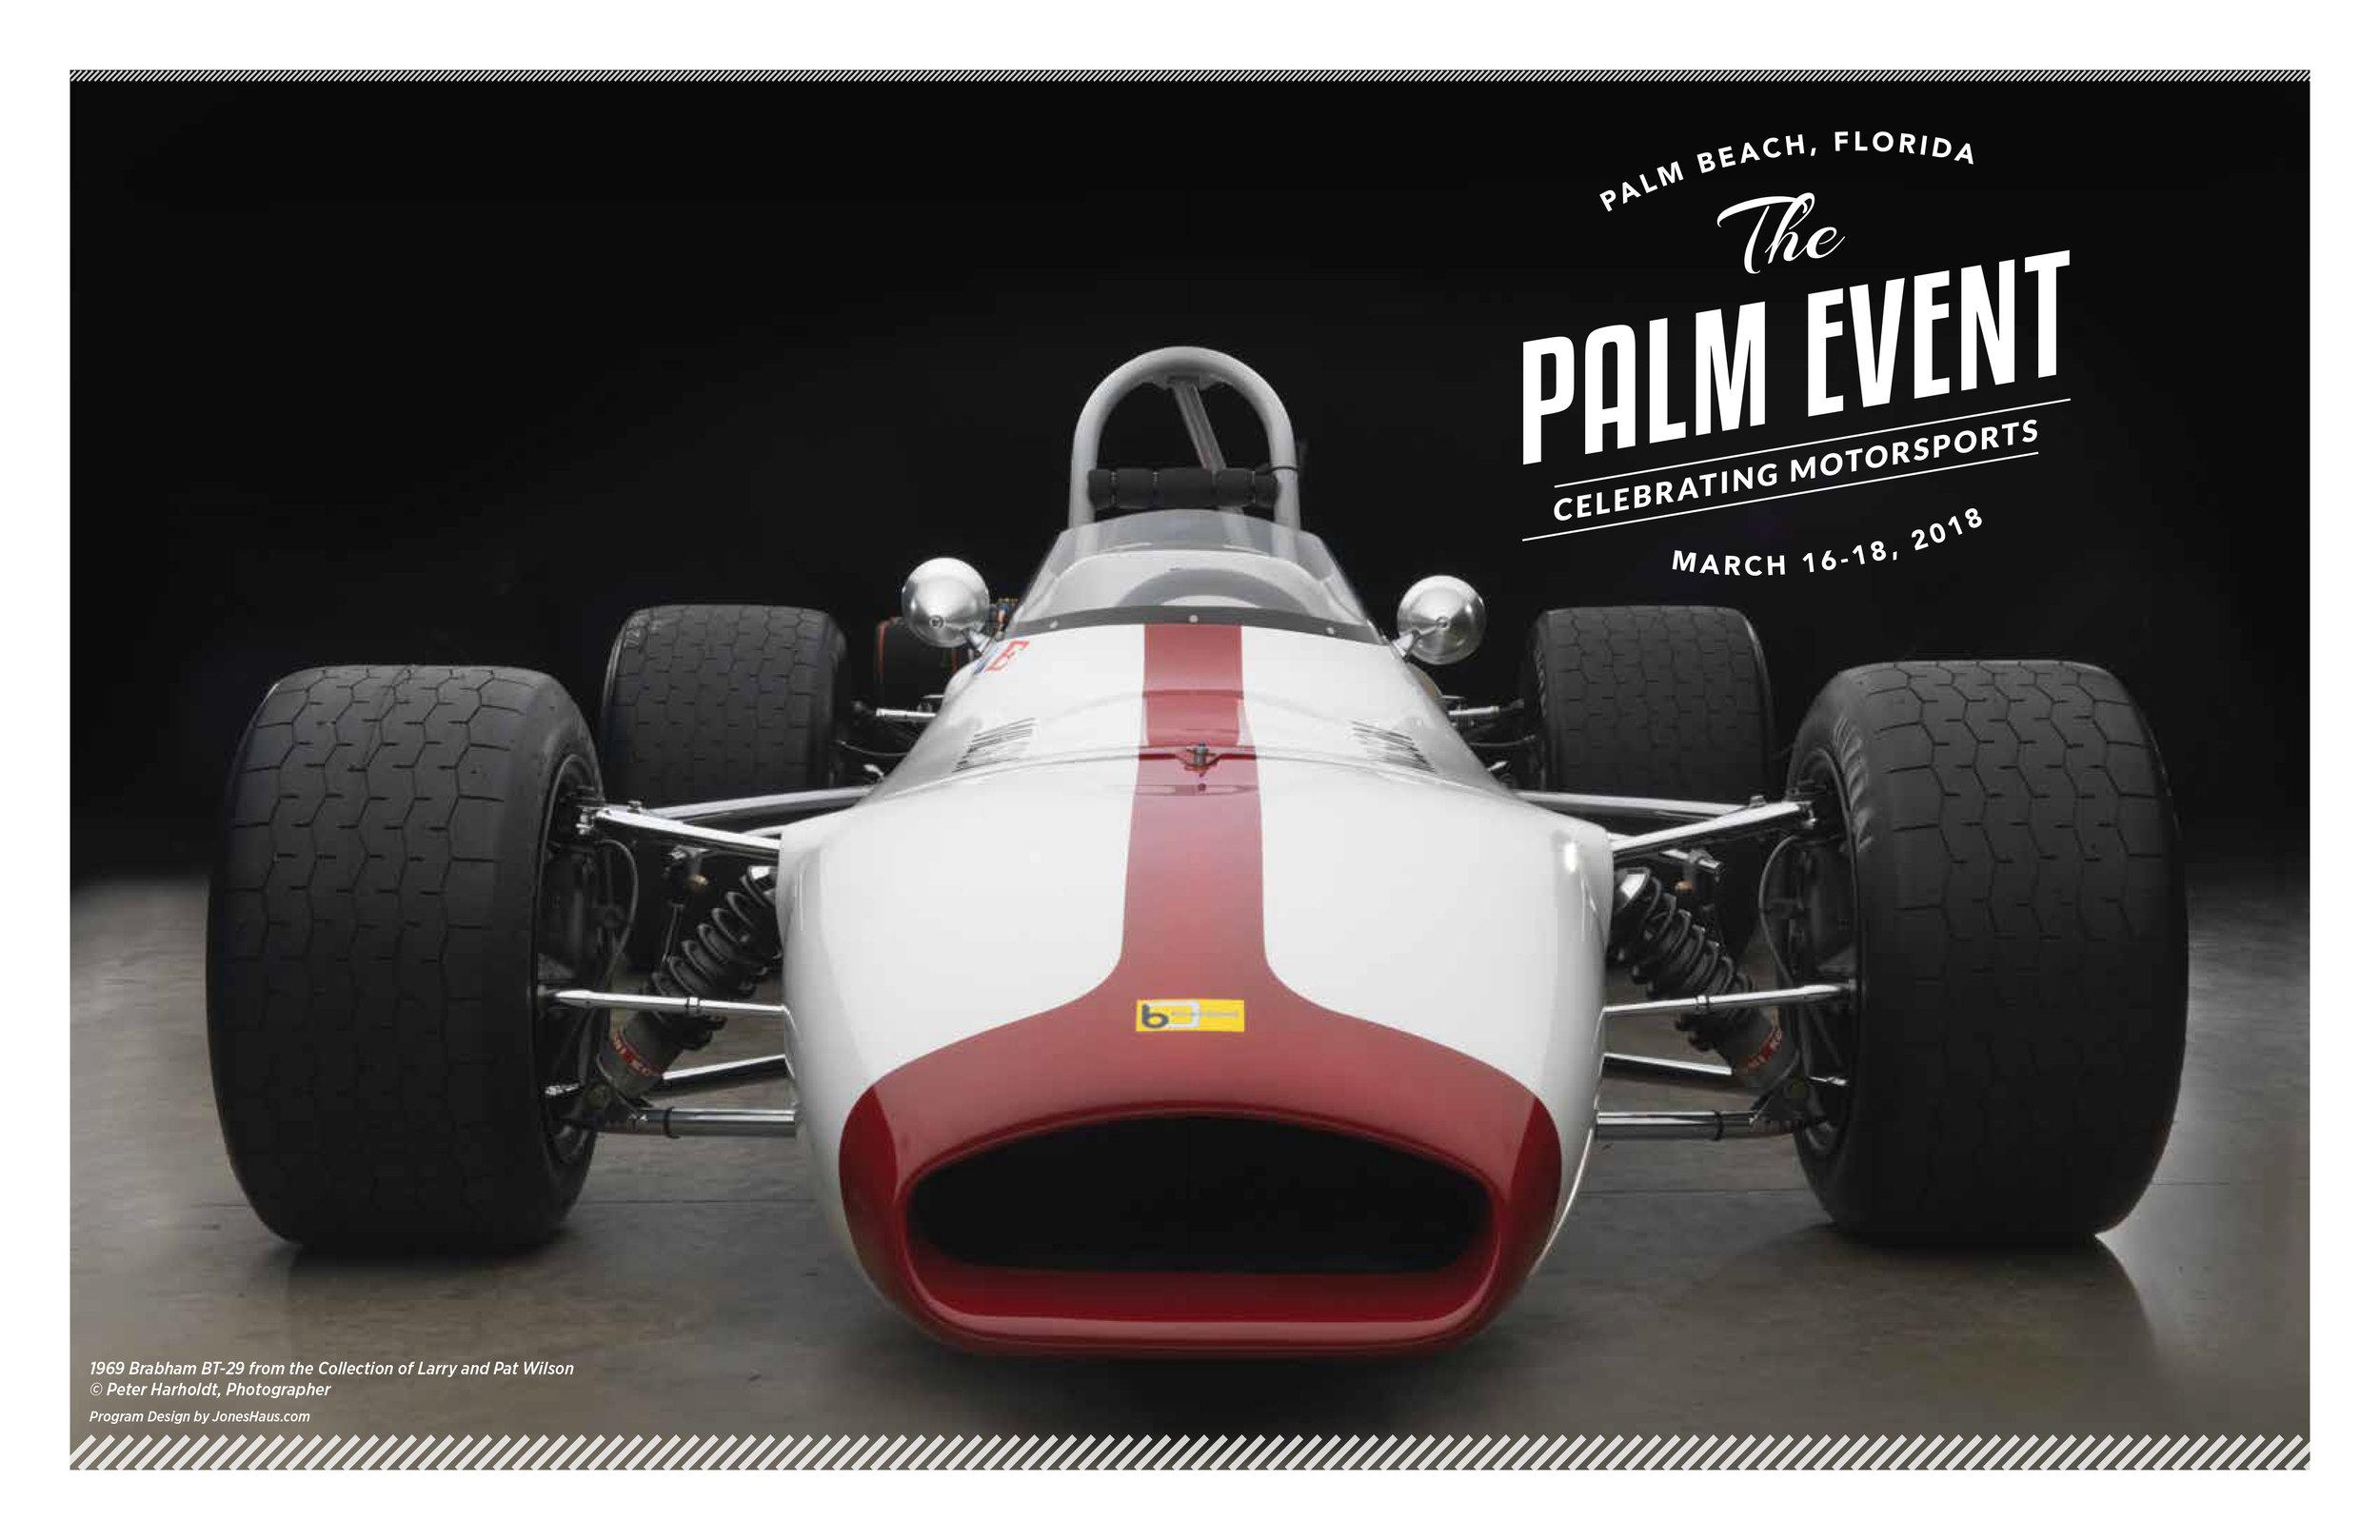 The Palm Event 2018 Commemorative Program